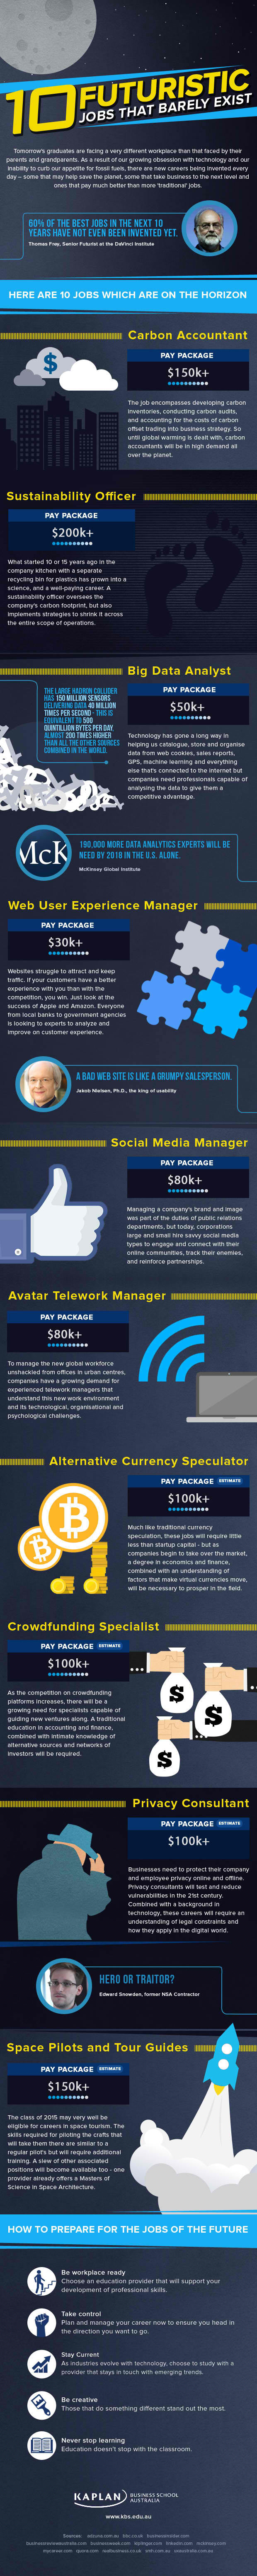 Futuristic jobs infographic